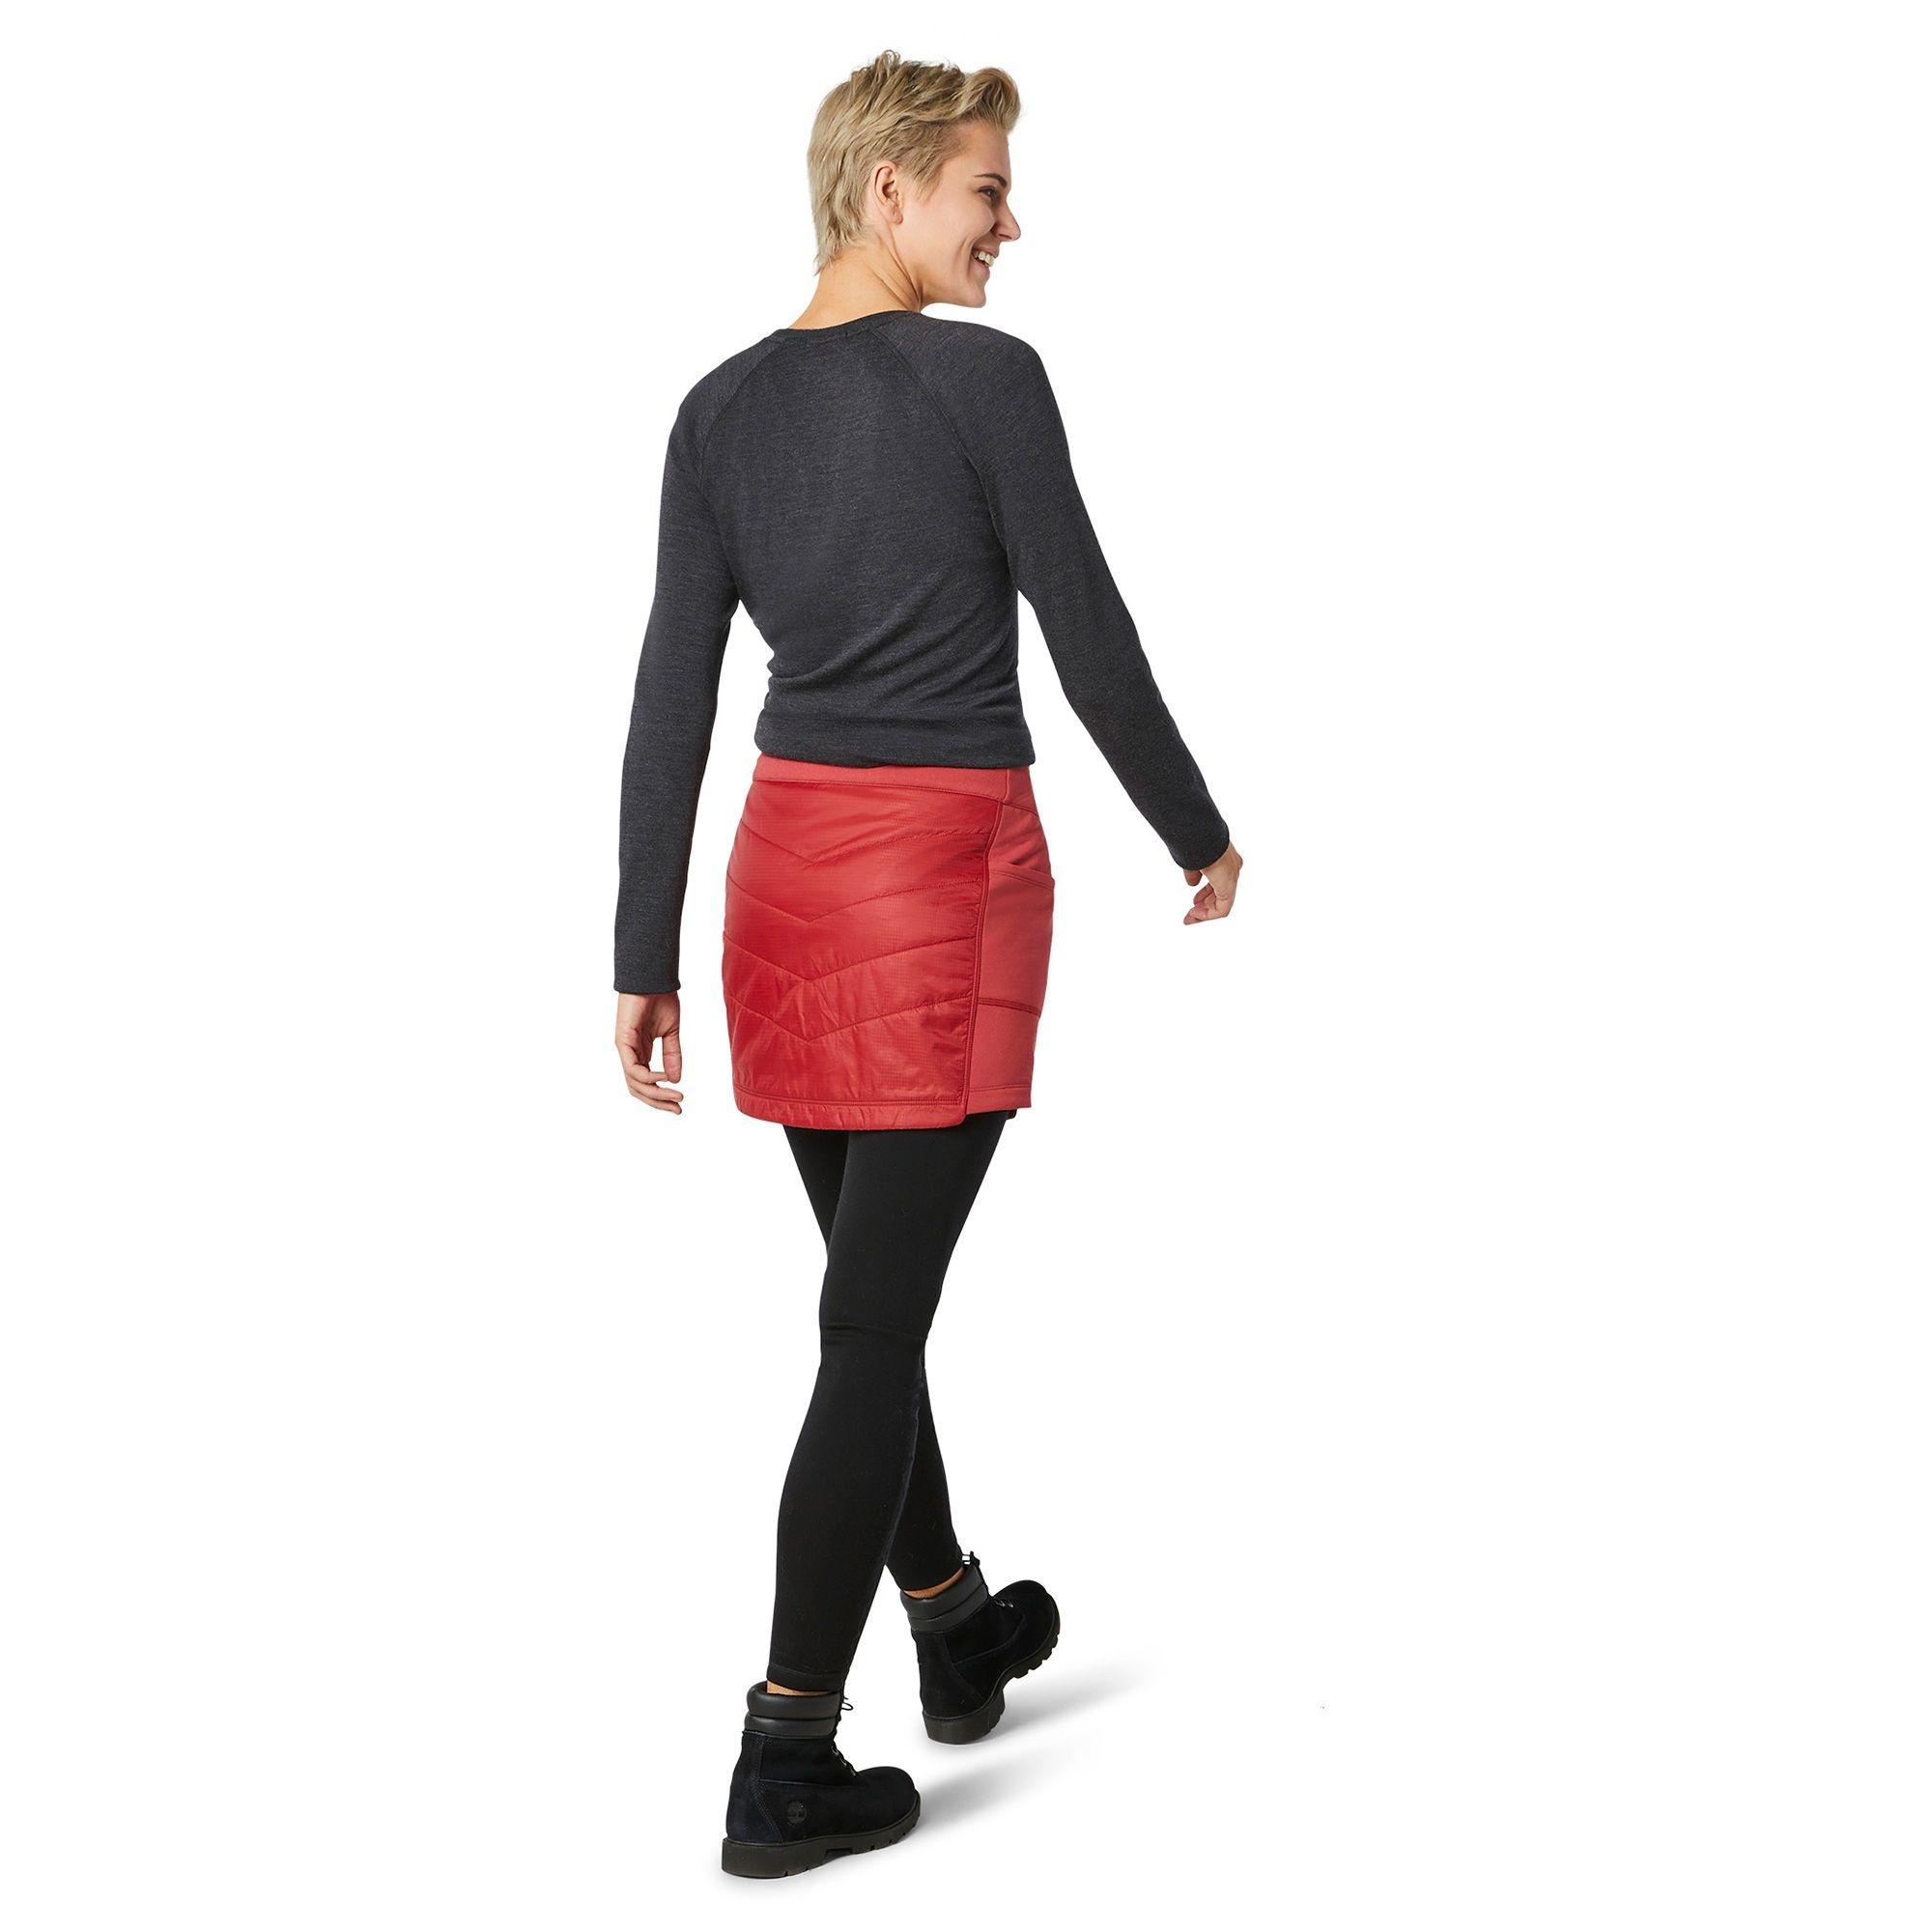 Smartwool Smartloft 60 Skirt, Marsala